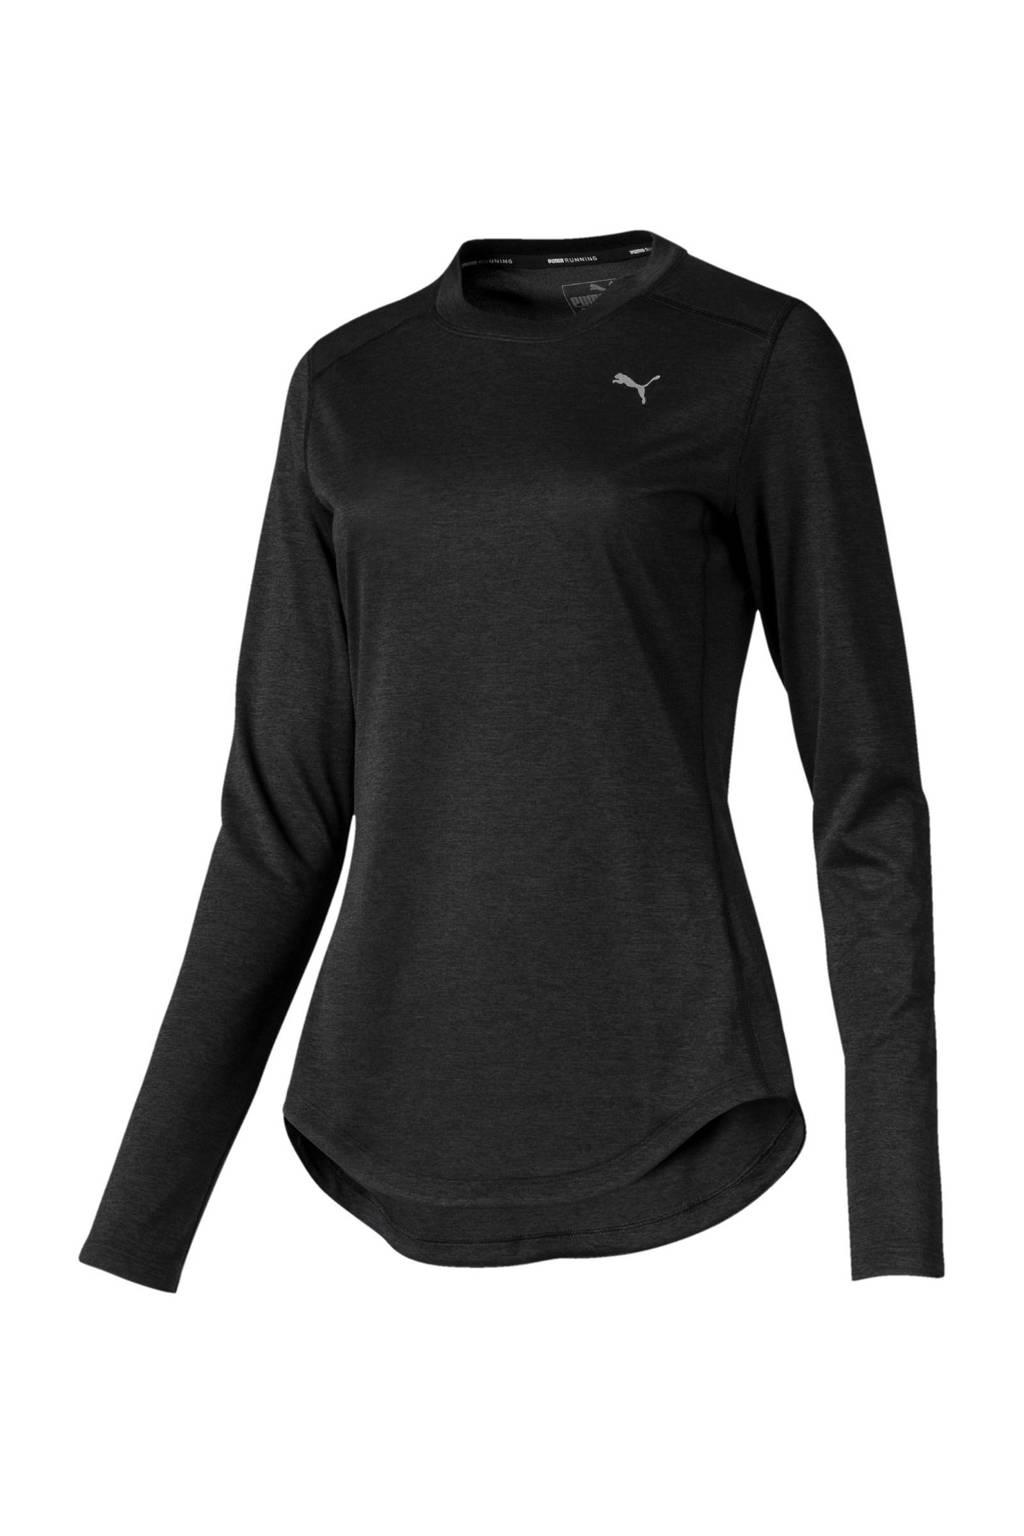 Puma hardloop T-shirt zwart, Zwart